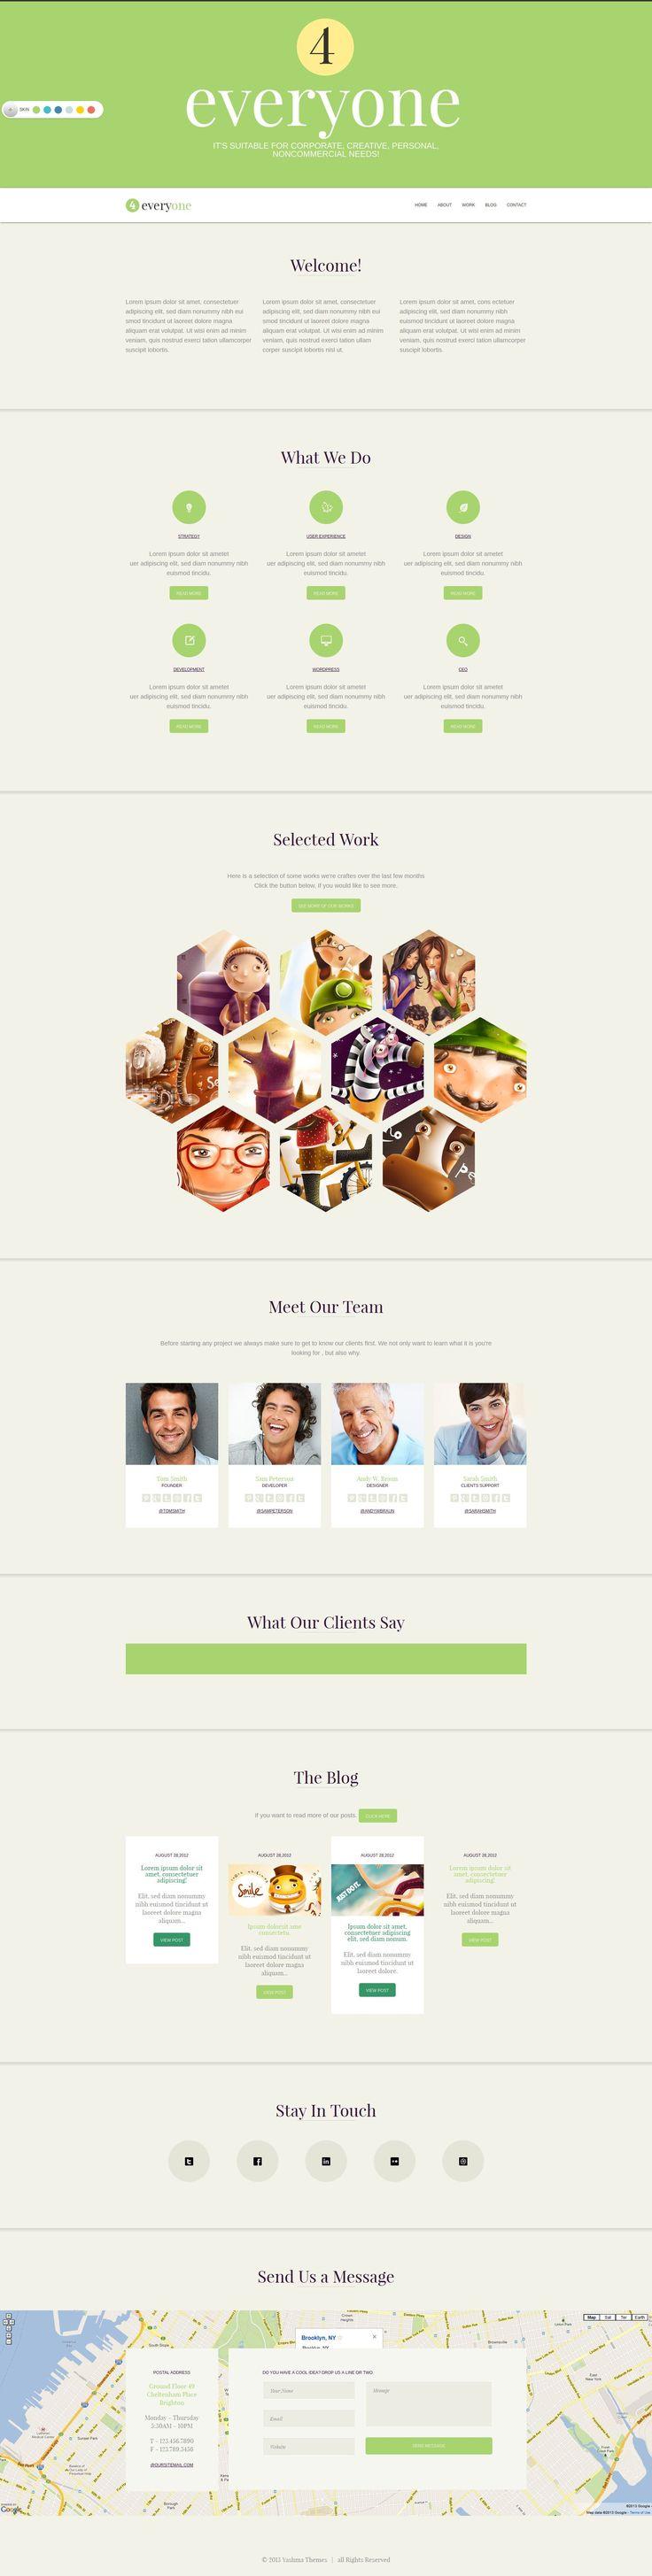 15 best Placeit mock ups images on Pinterest | Miniatures, Mockup ...